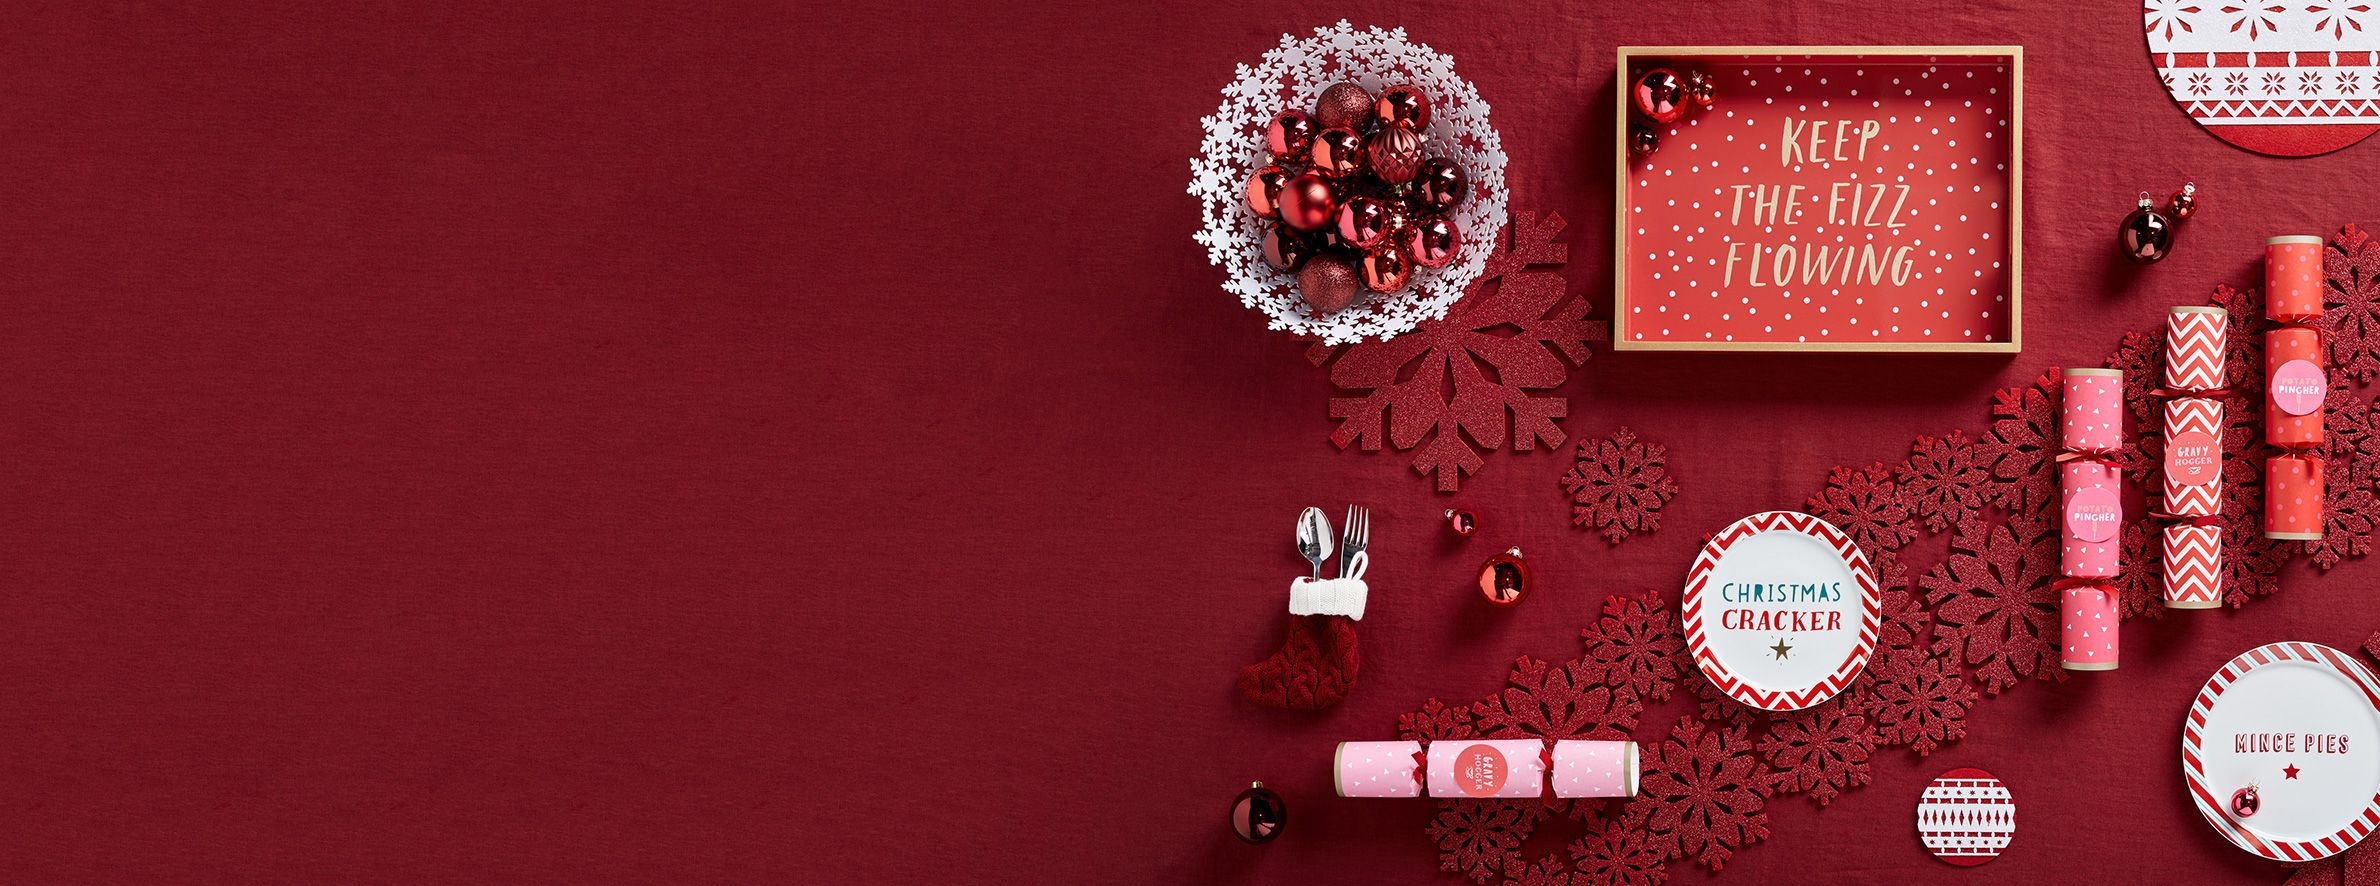 Ruby Wedding Gifts John Lewis: Buy Cutlery, Tea Sets & Plates